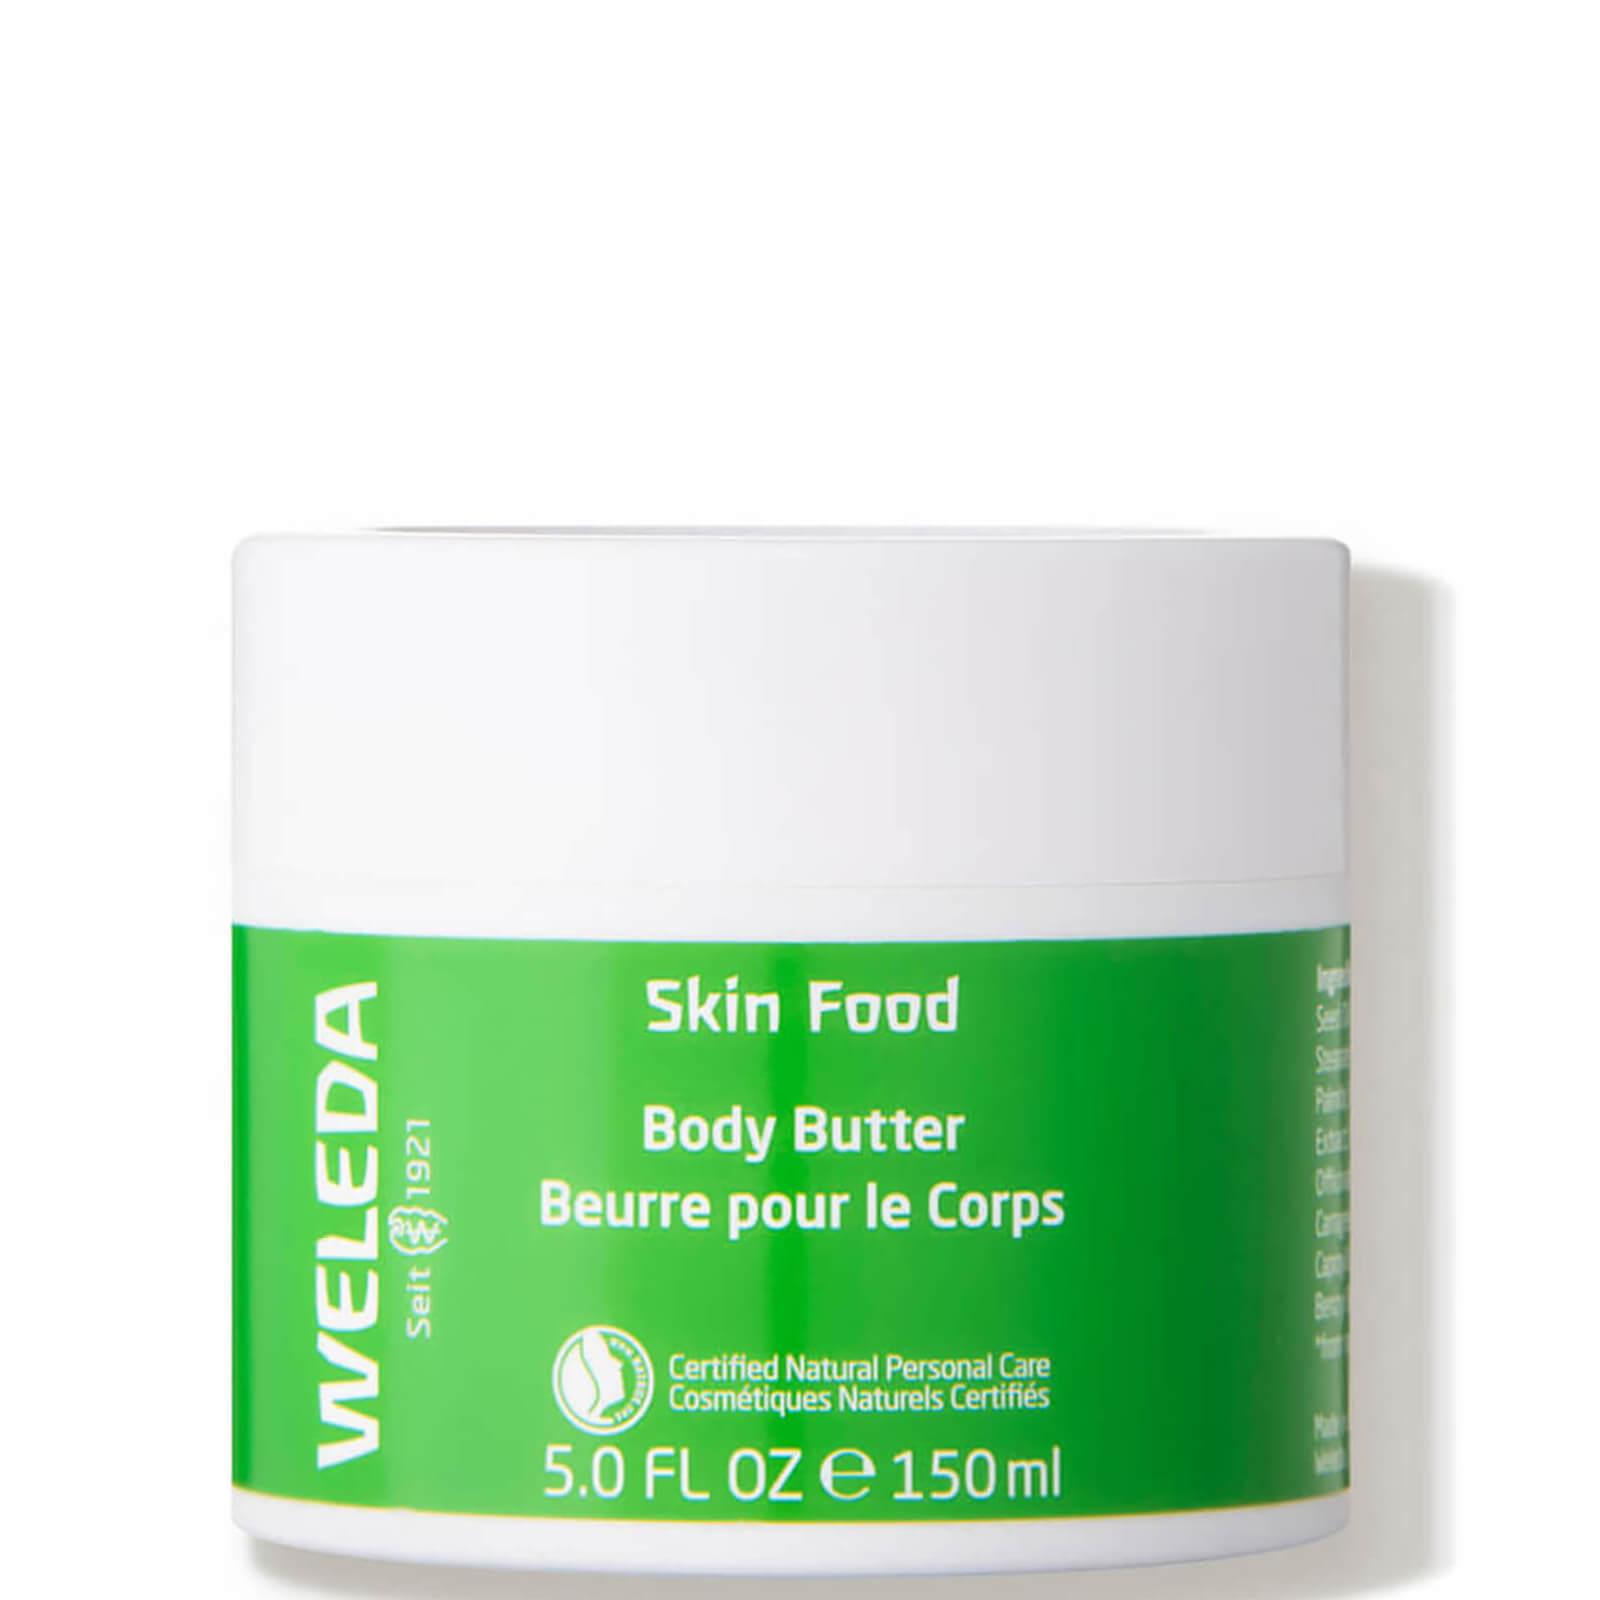 Купить Weleda Skin Food Body Butter 150ml